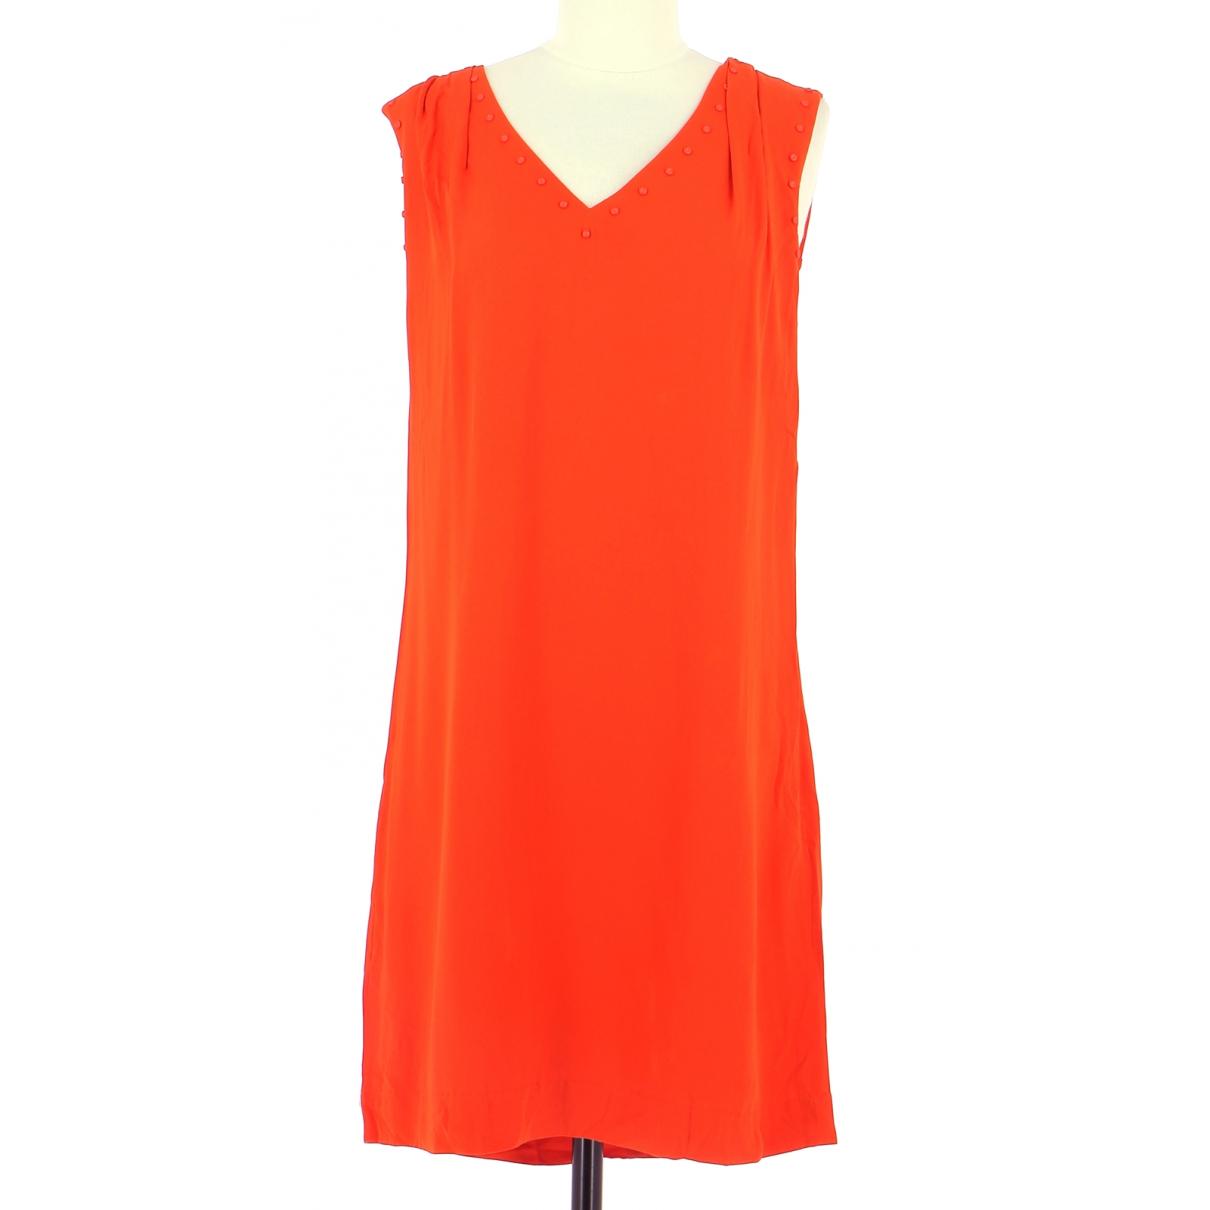 Sud Express \N Orange dress for Women 36 FR